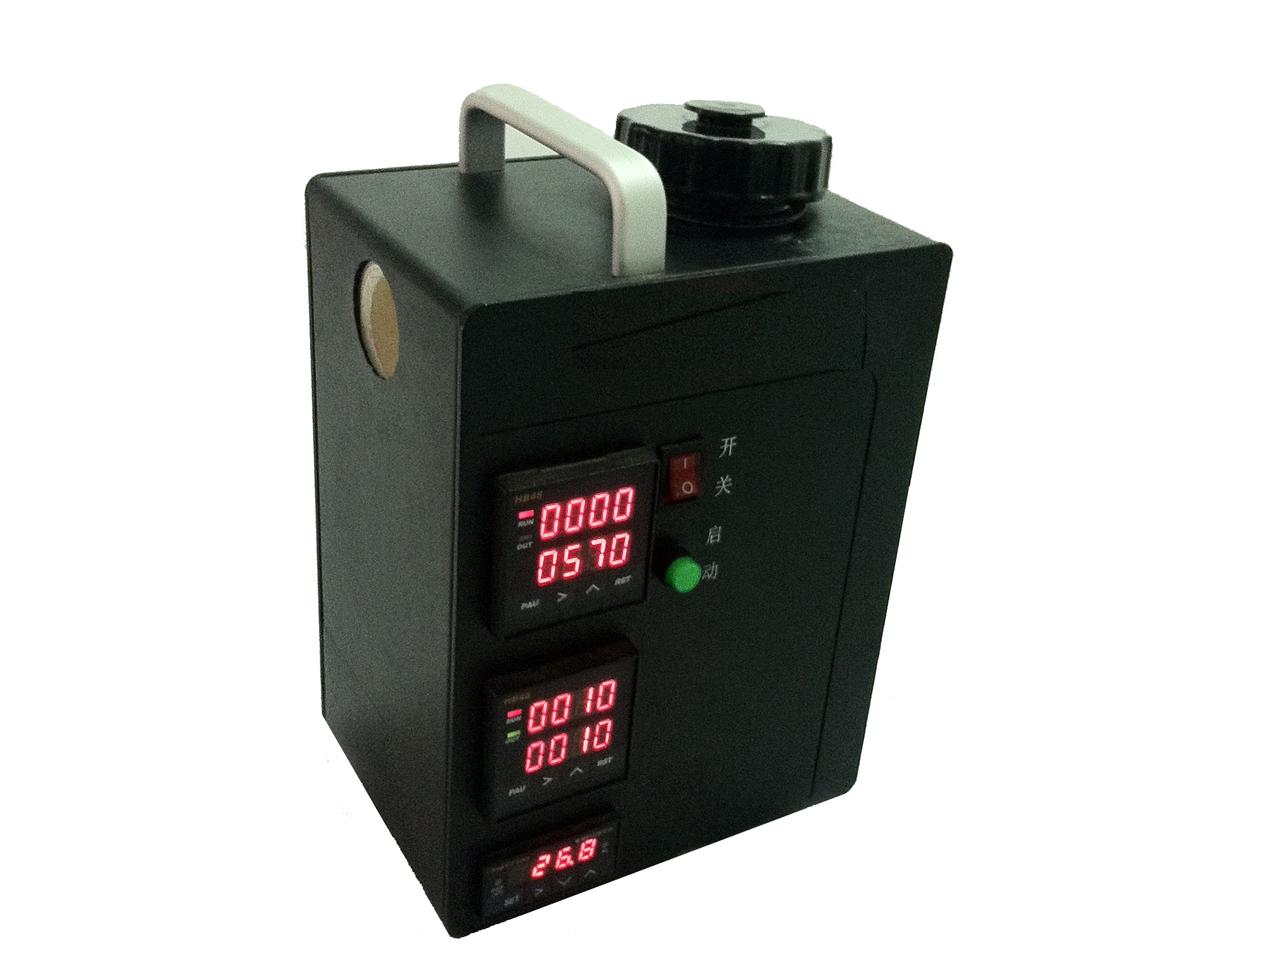 JF2300型测酒仪标定装置